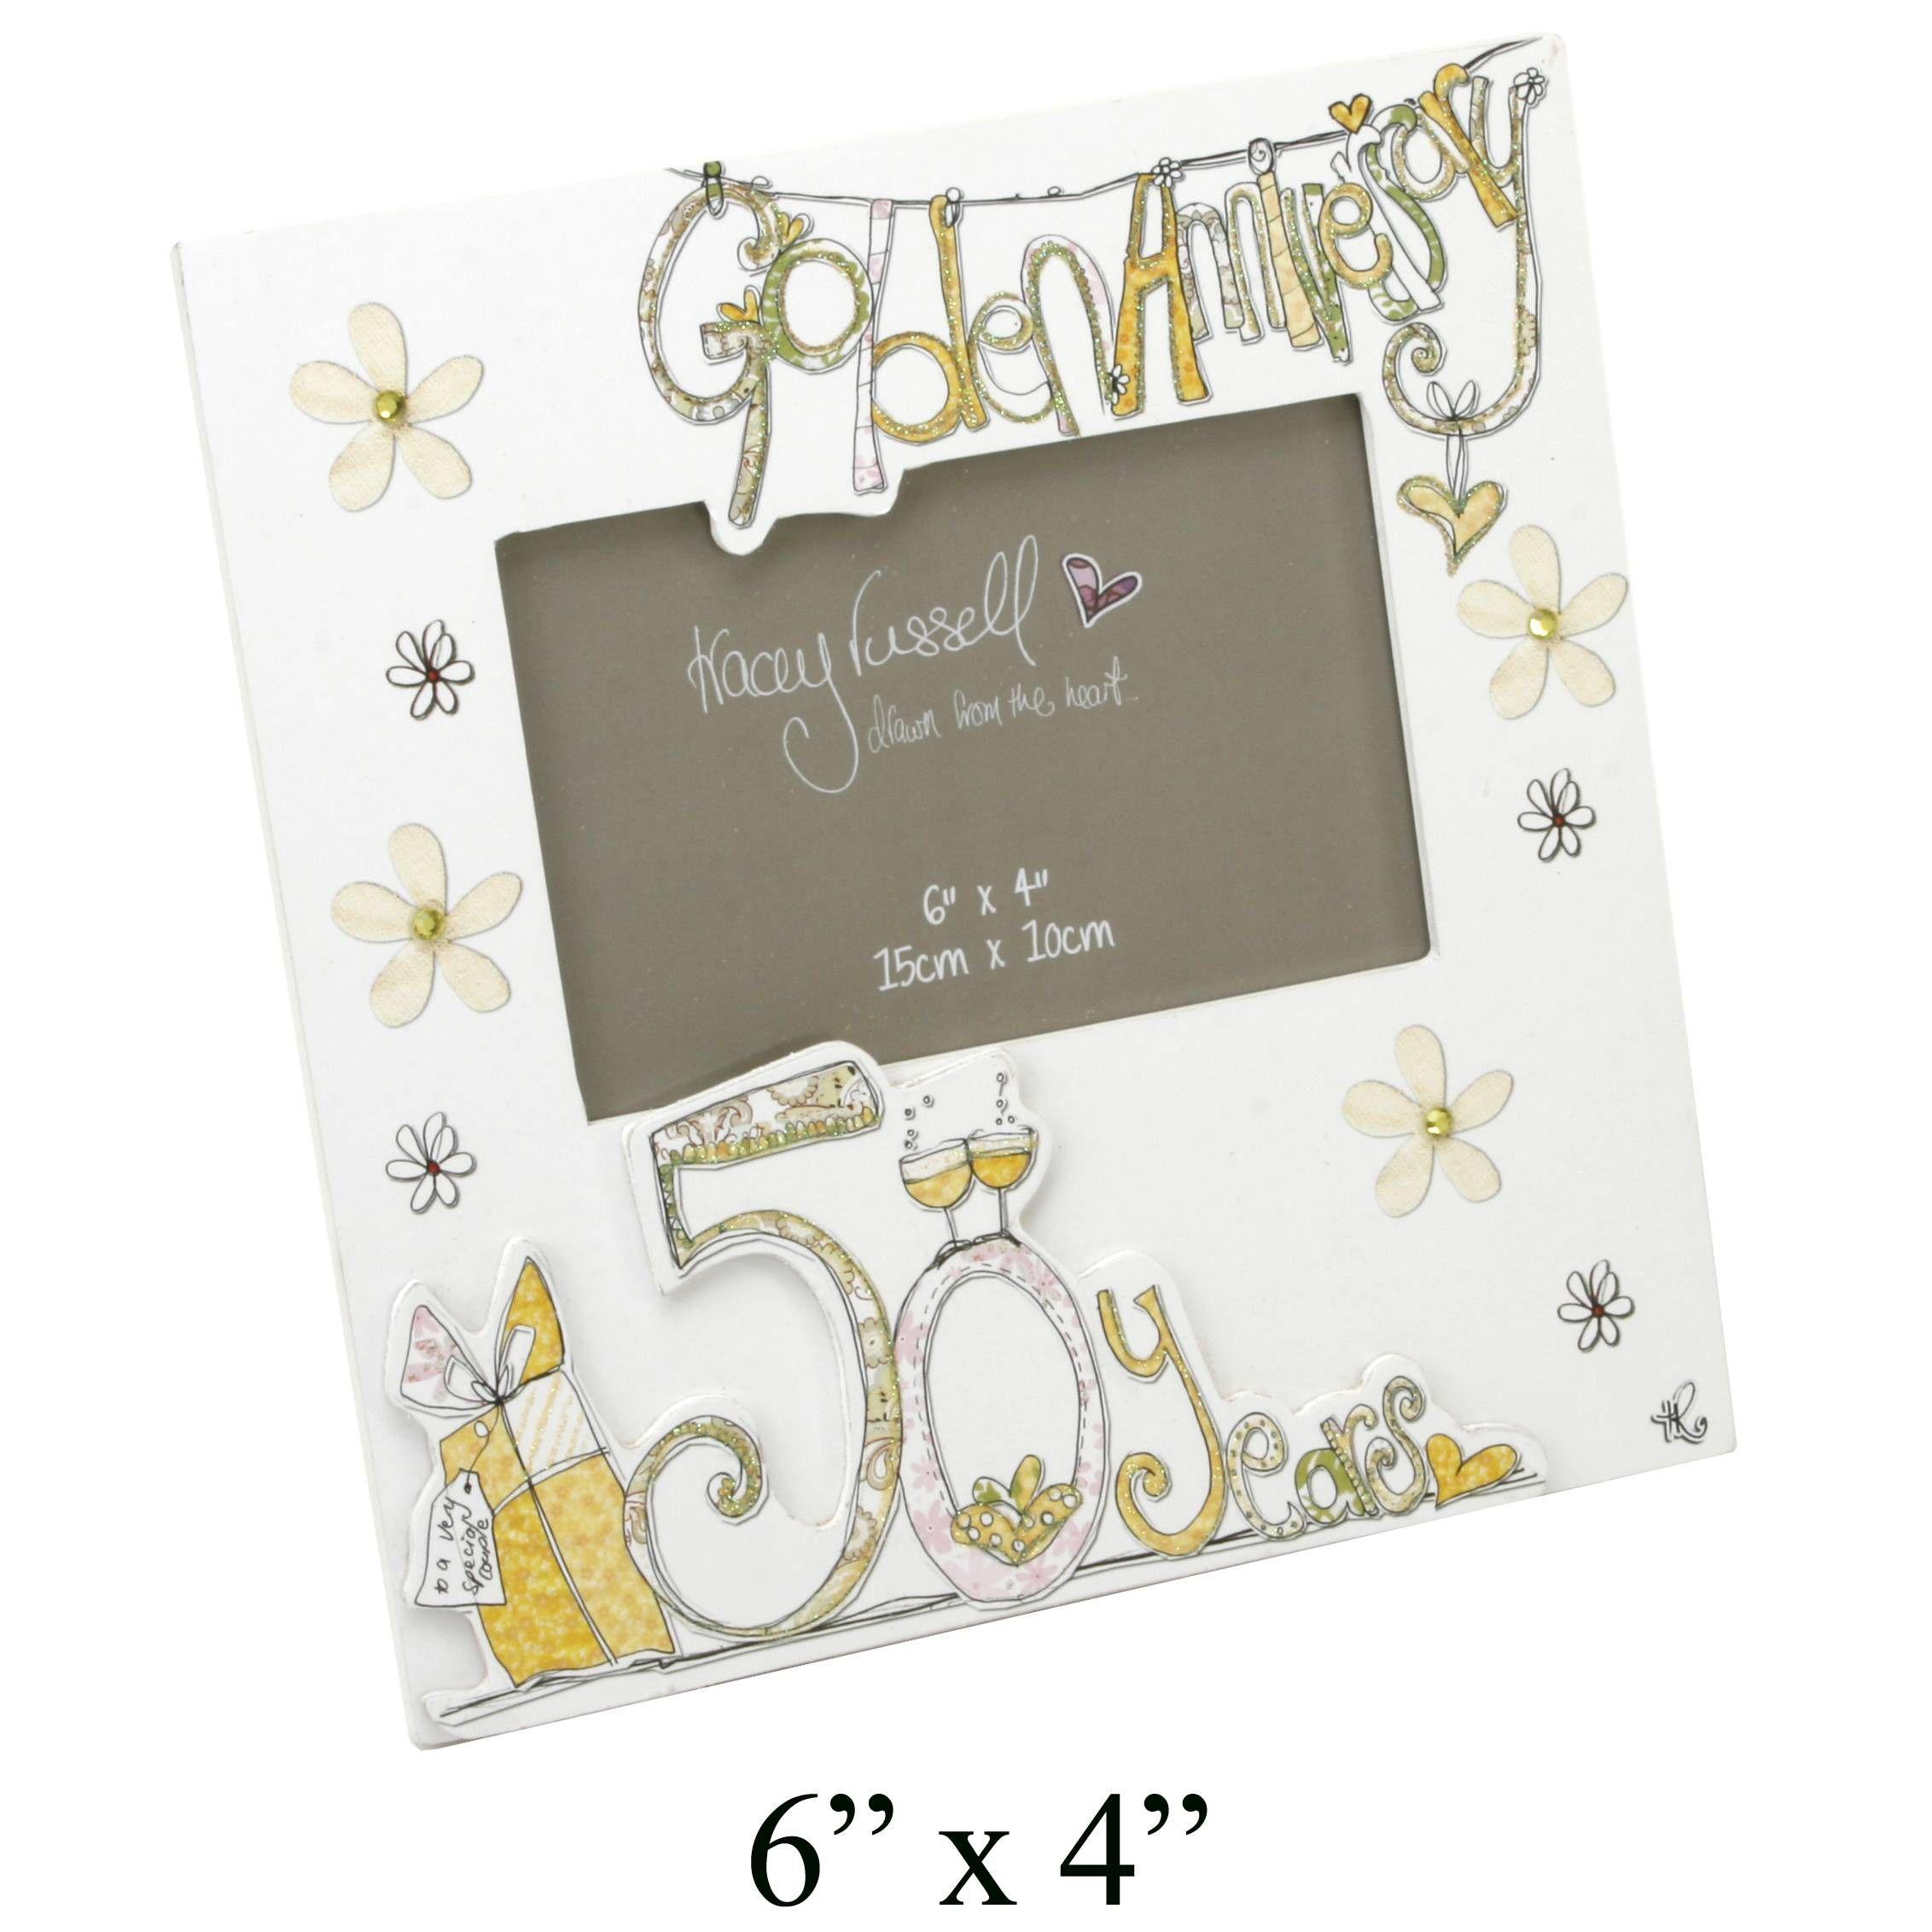 50th Wedding Anniversary Centerpieces | 50th wedding anniversary ...